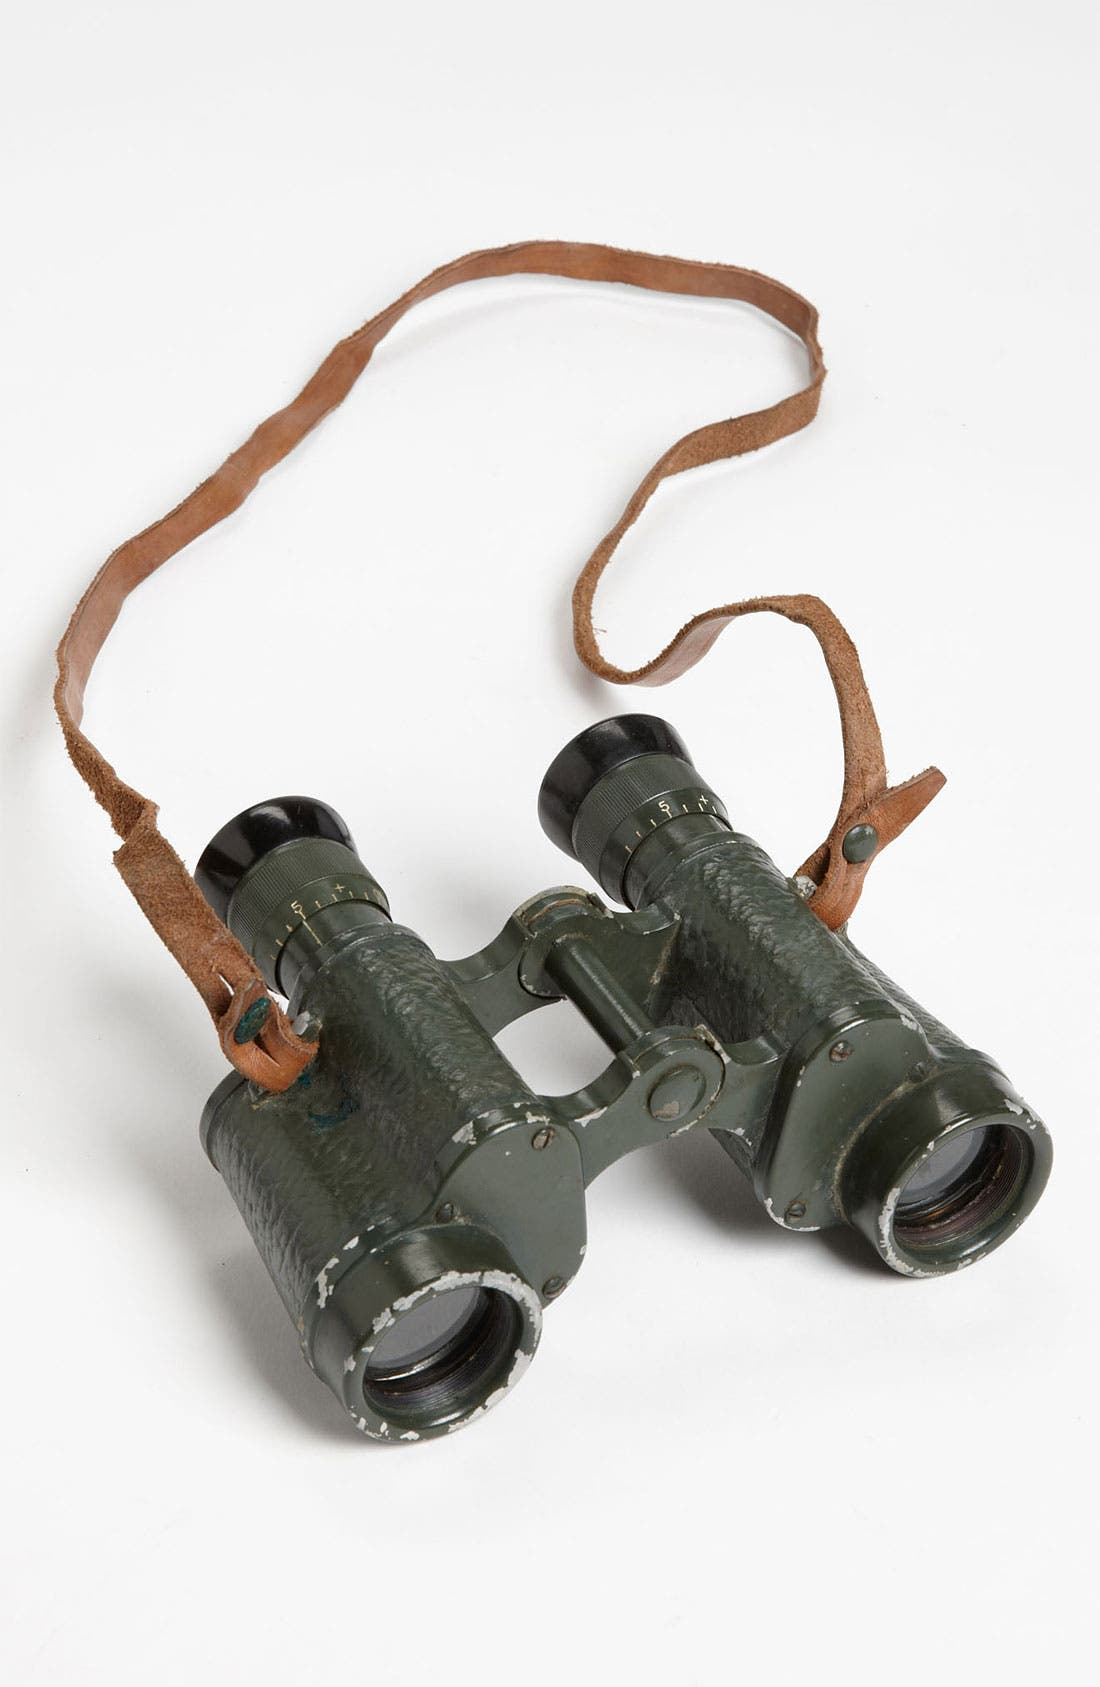 Main Image - Europe2You Found Binoculars